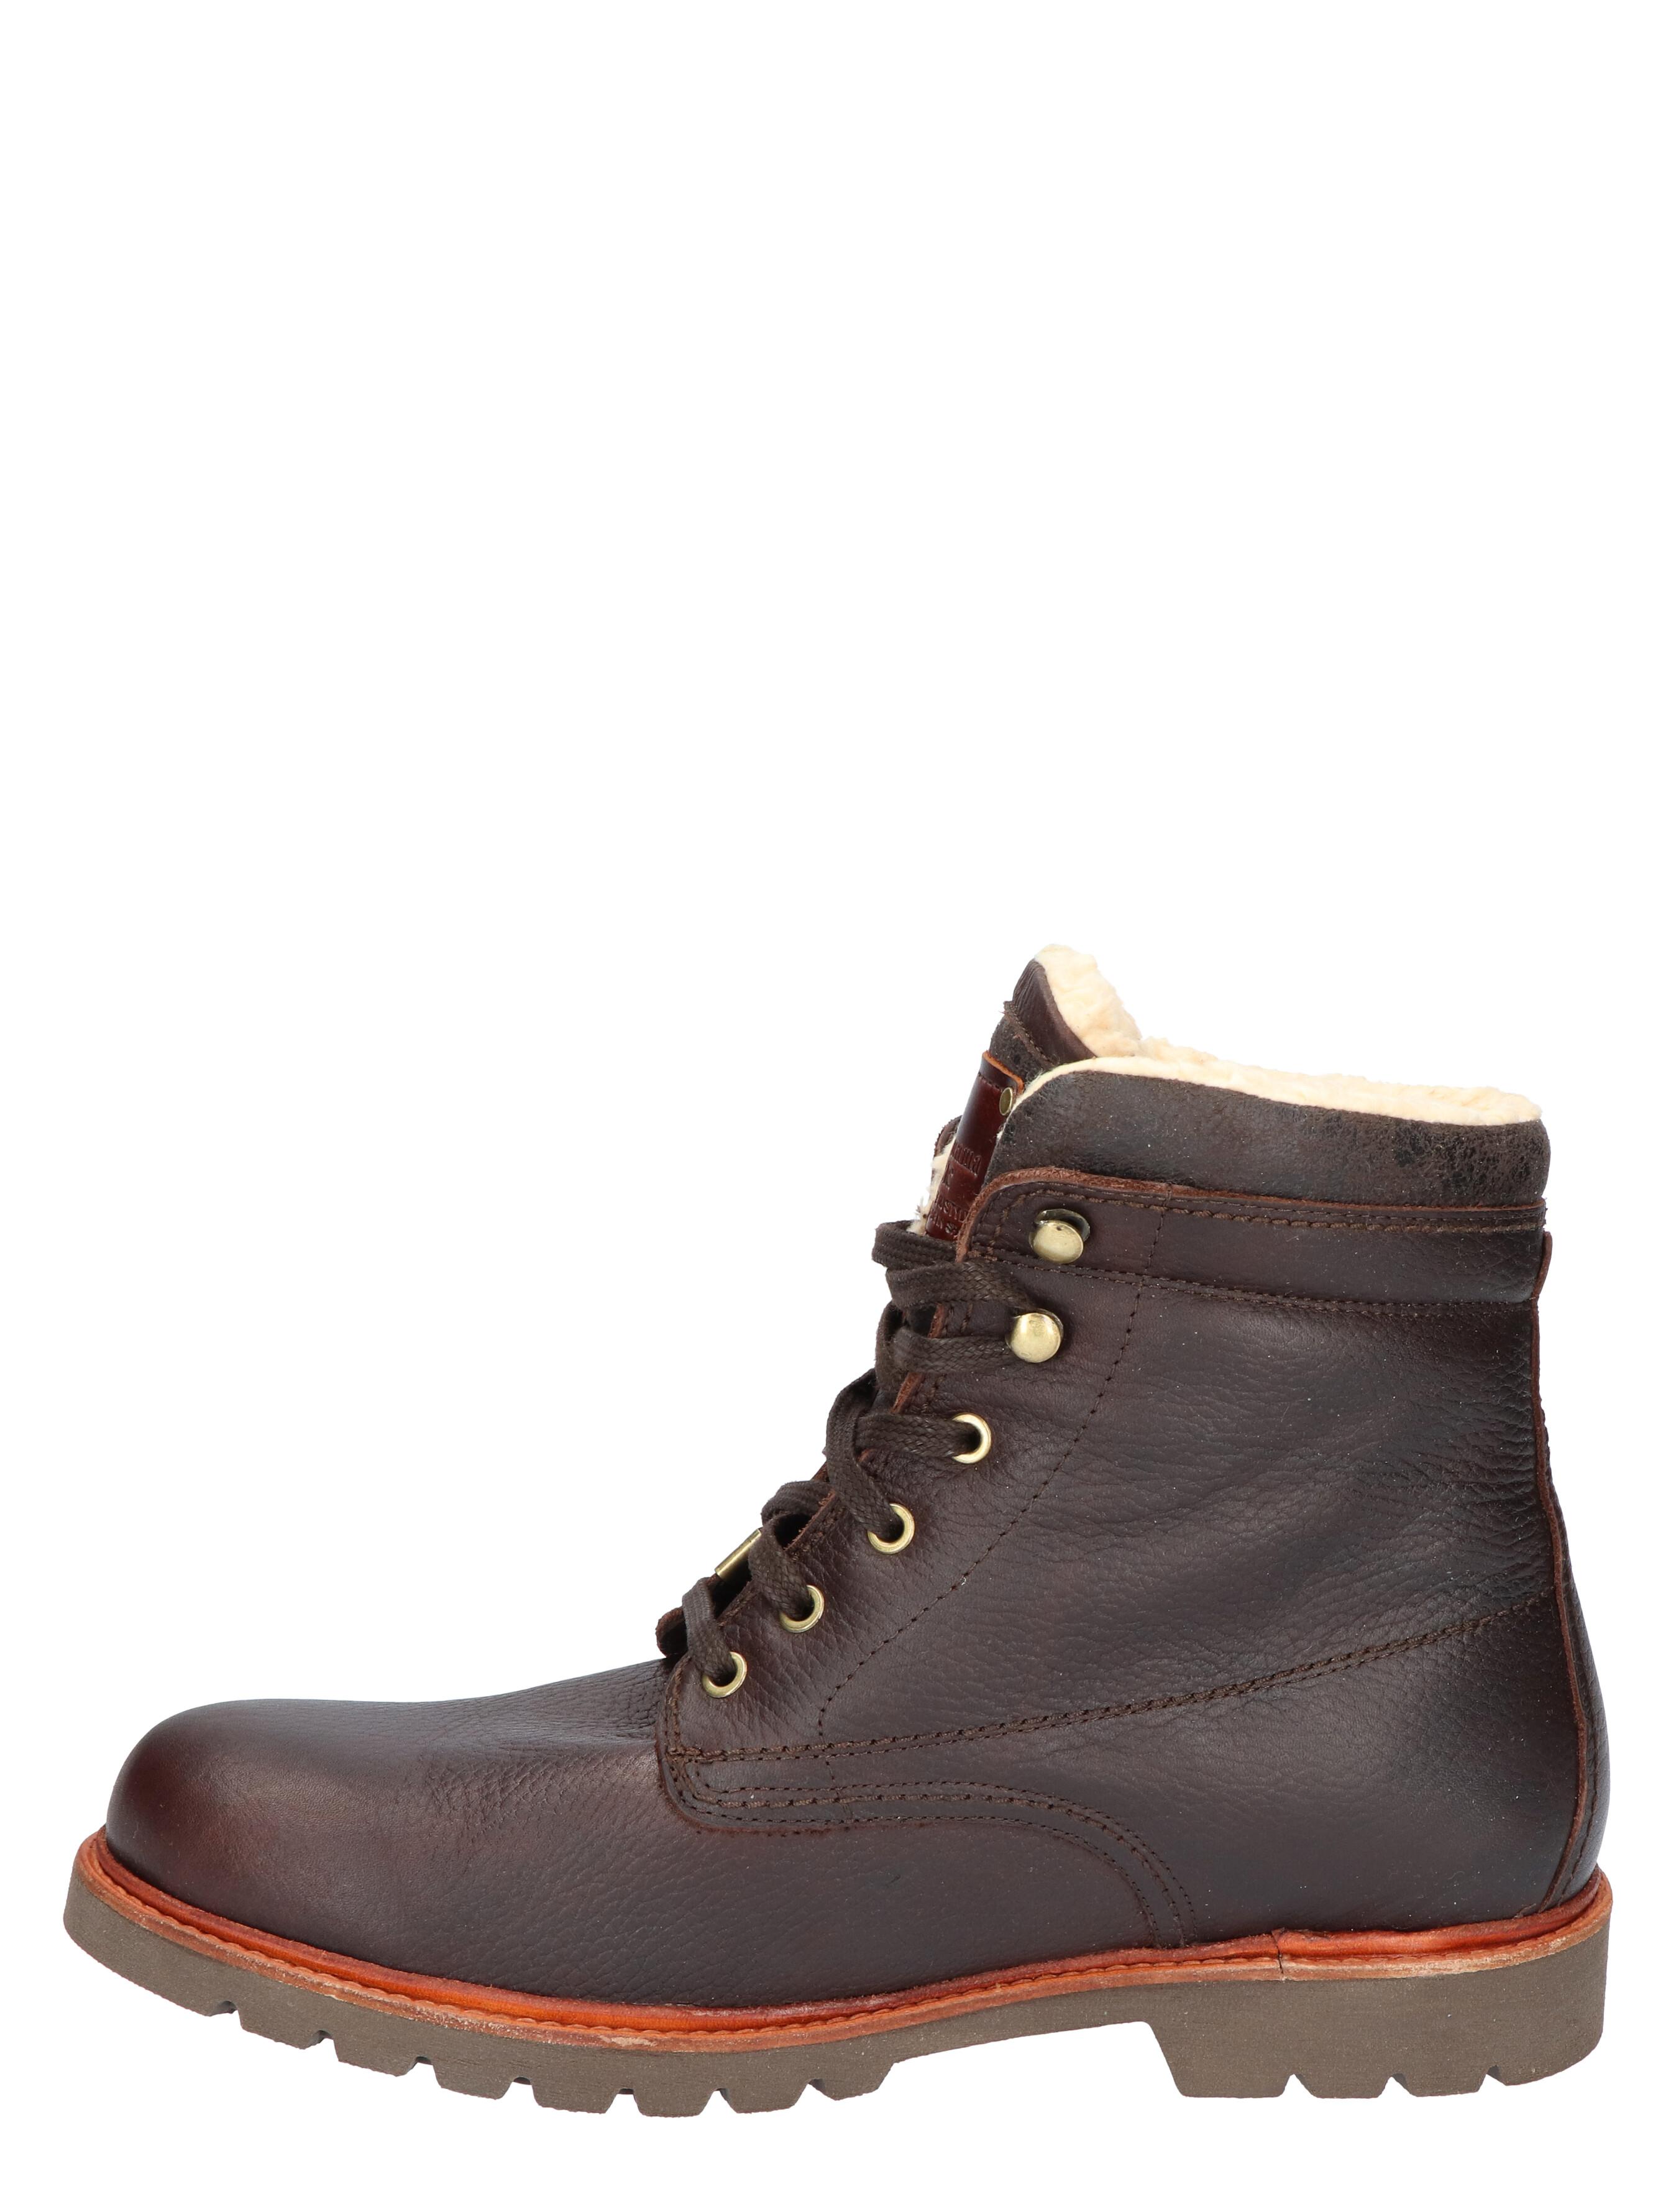 Panama Jack Panama 03 Aviator Brown Boots veter-boots